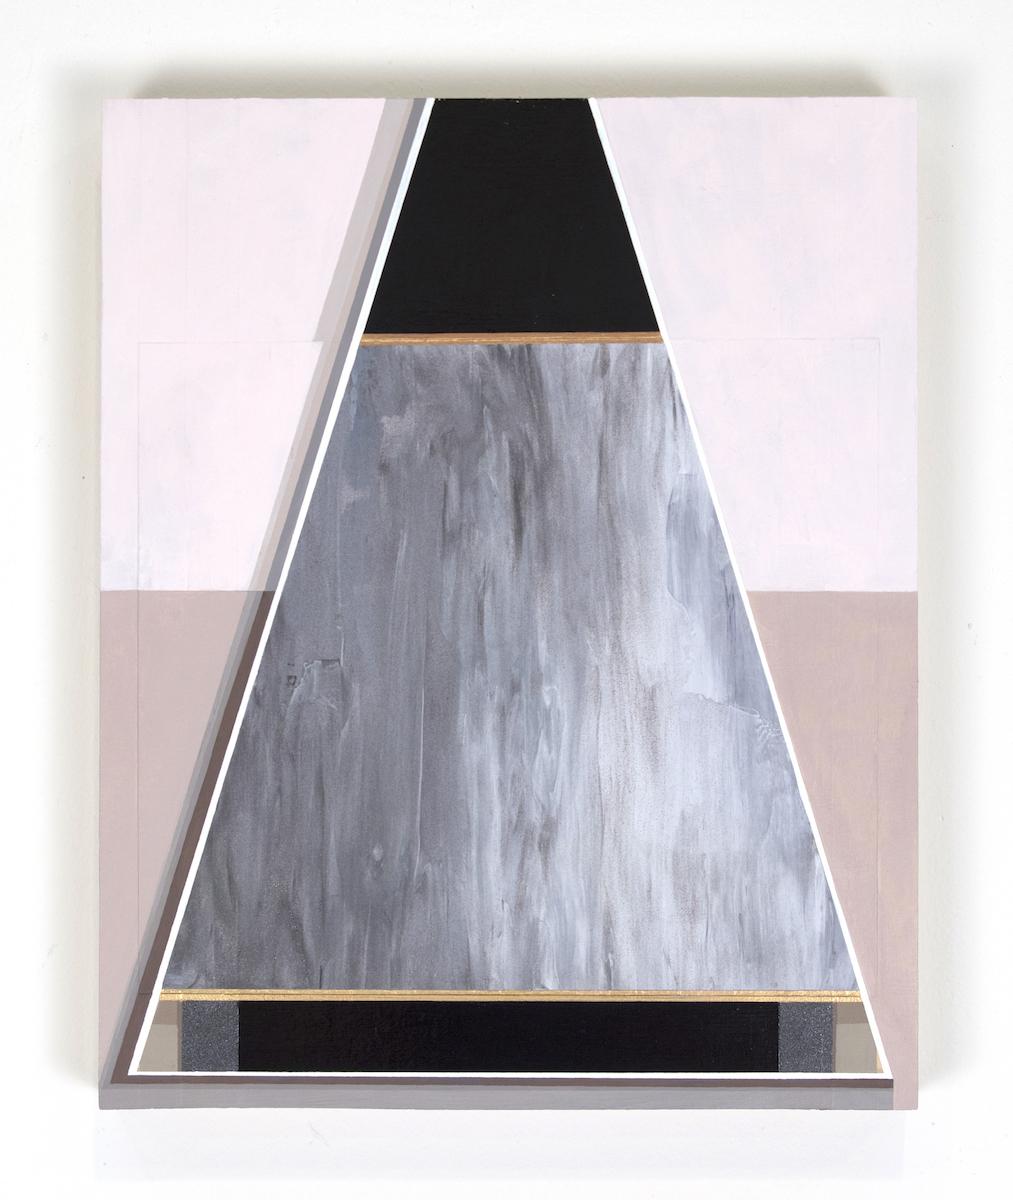 "Mary Laube, Cascade, acrylic on panel, 12""x9.5"", 2018"